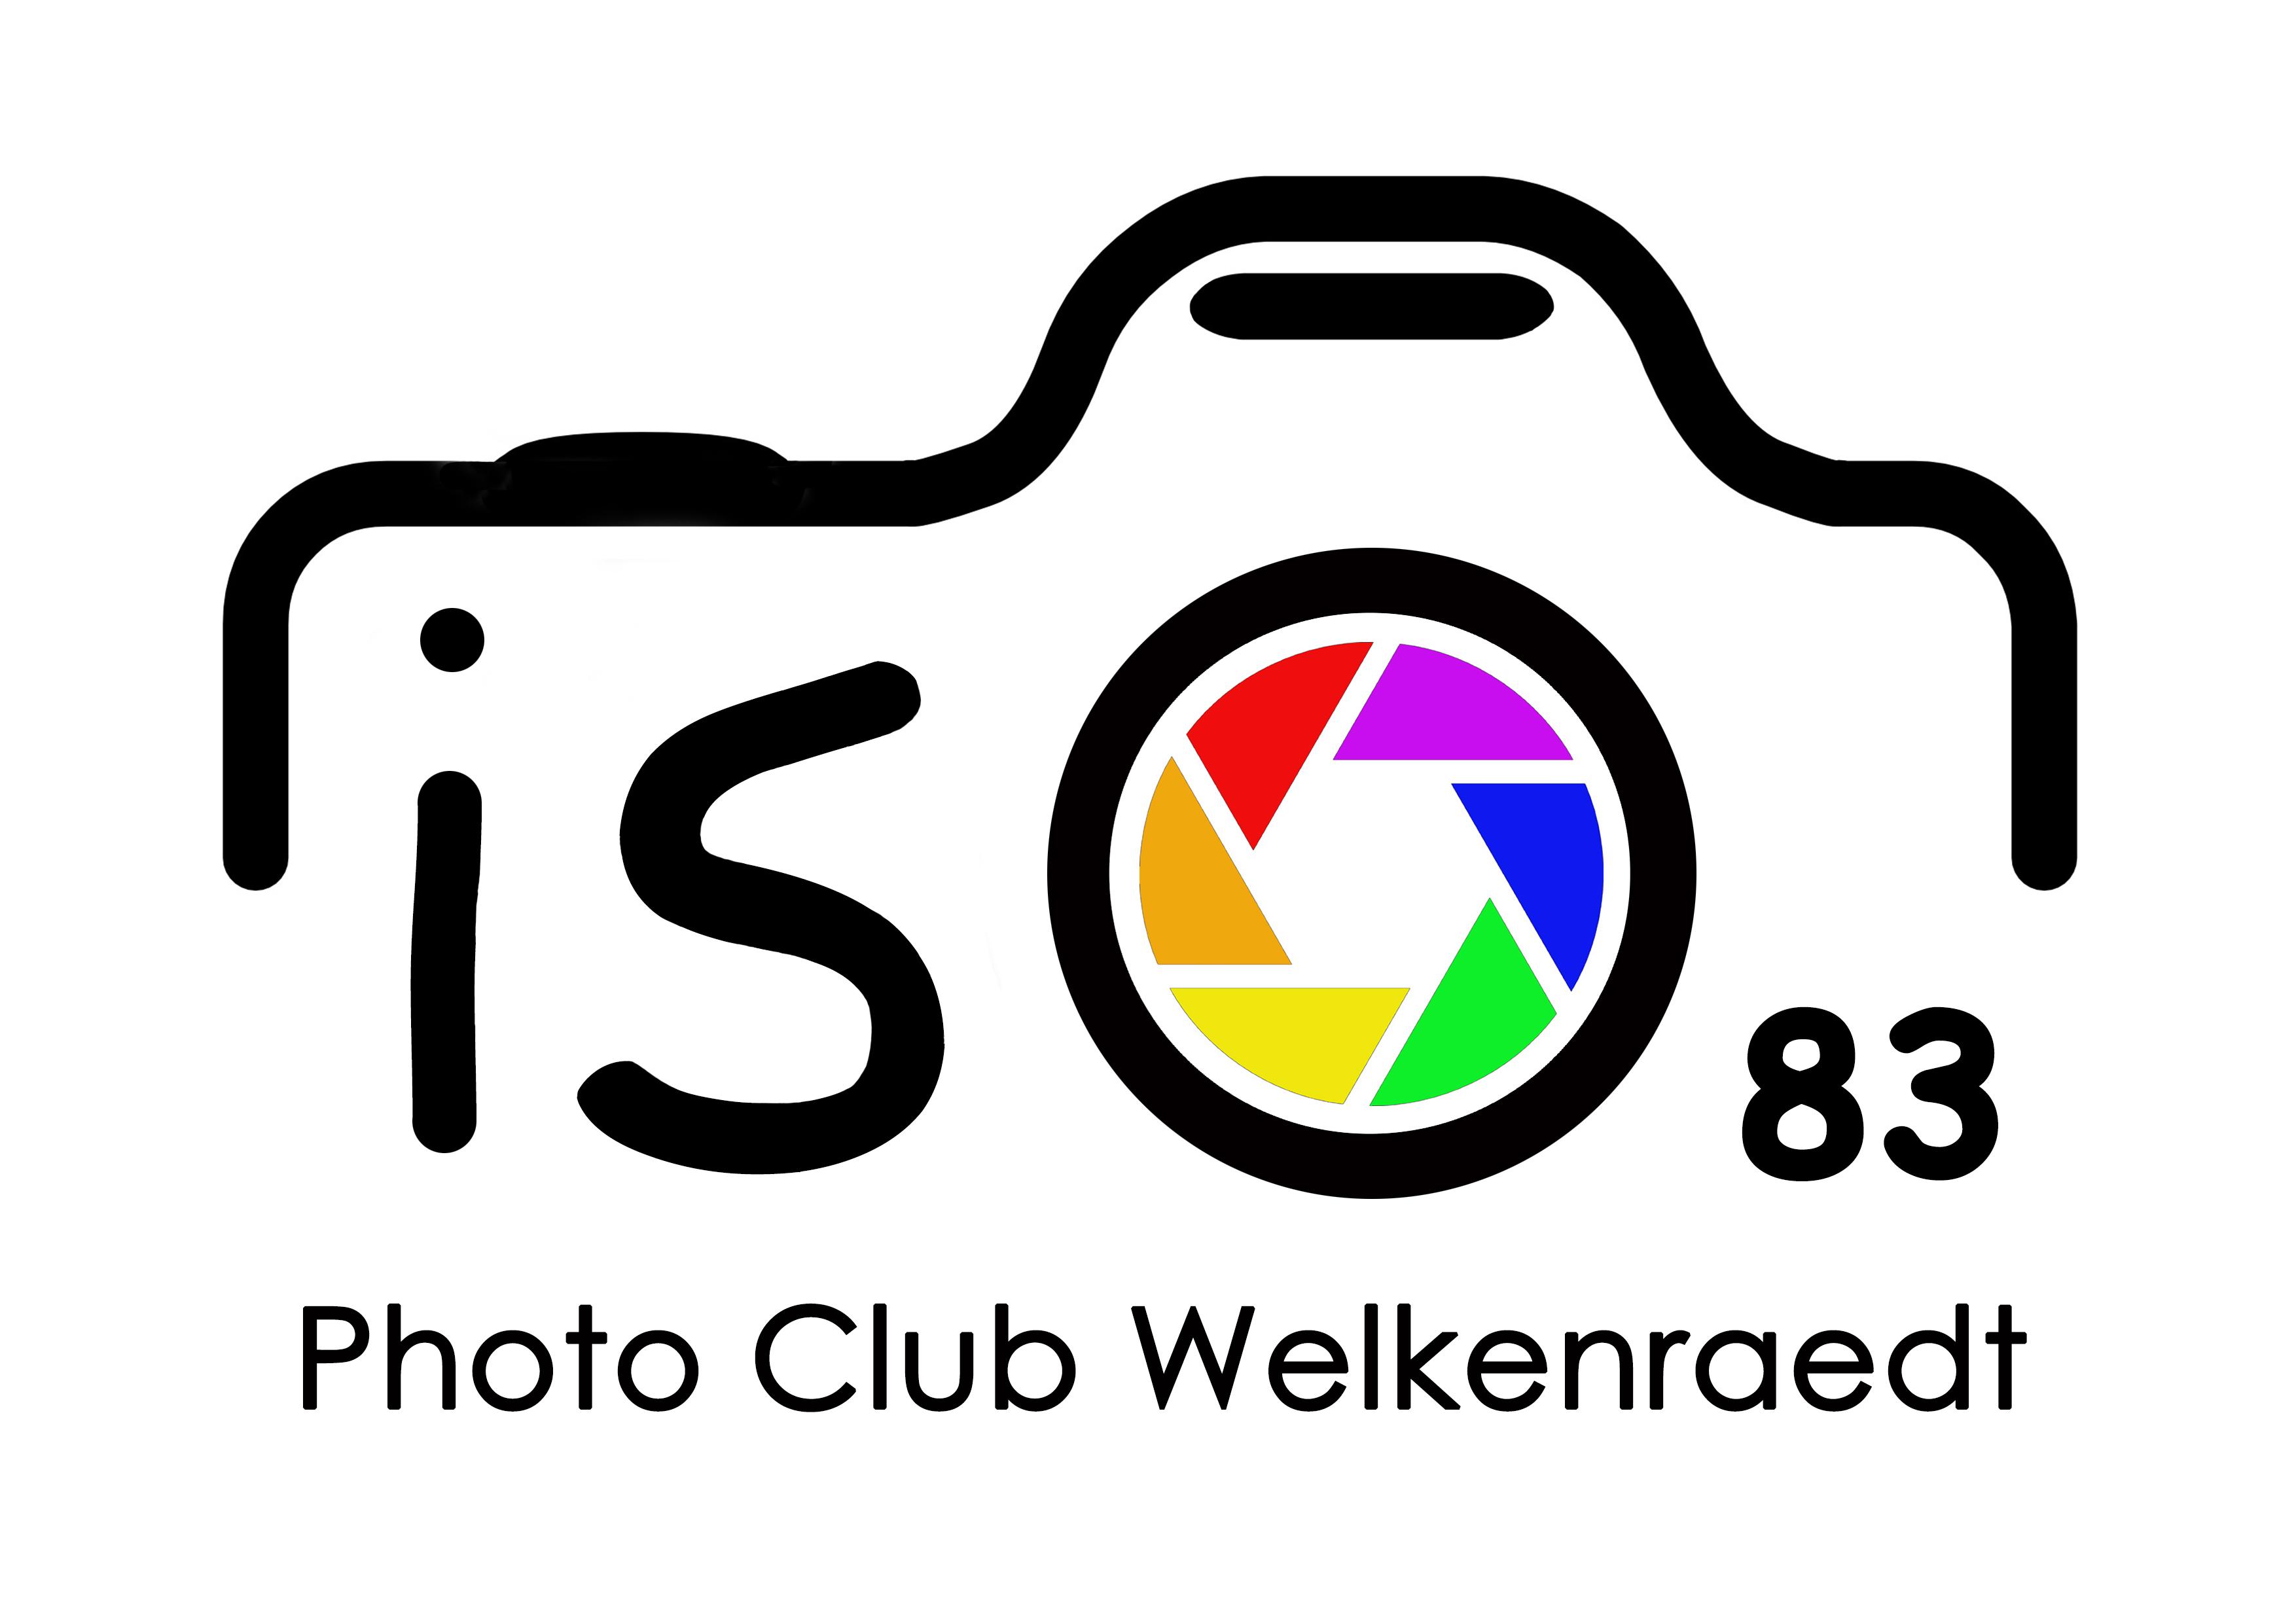 LOGO ISO 83